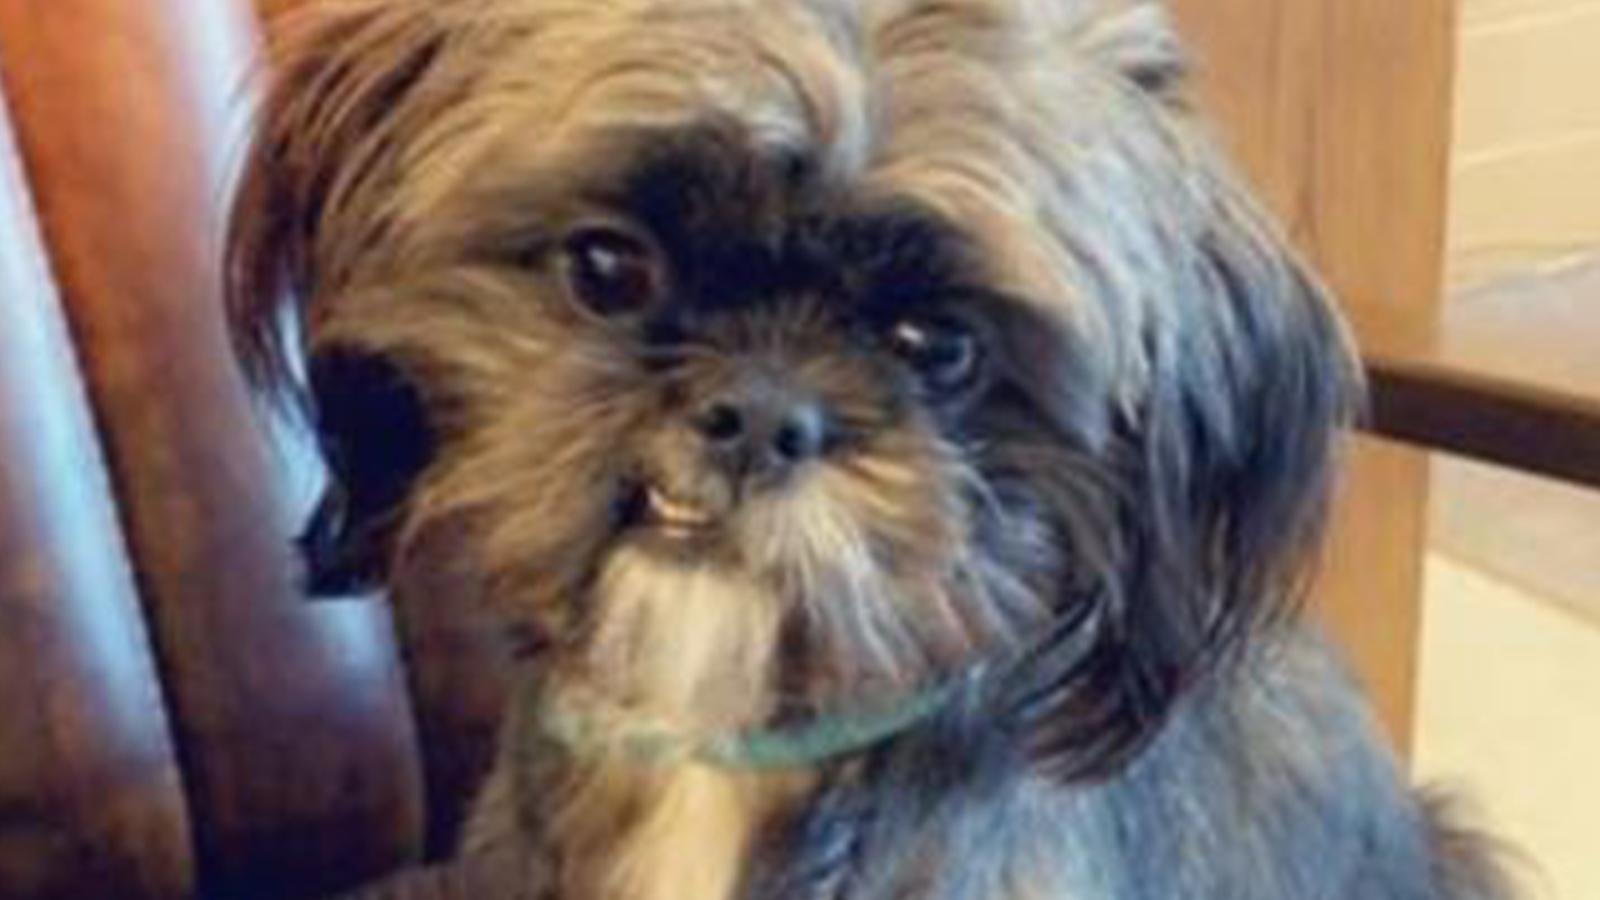 Houston woman says someone threw acid on her service dog